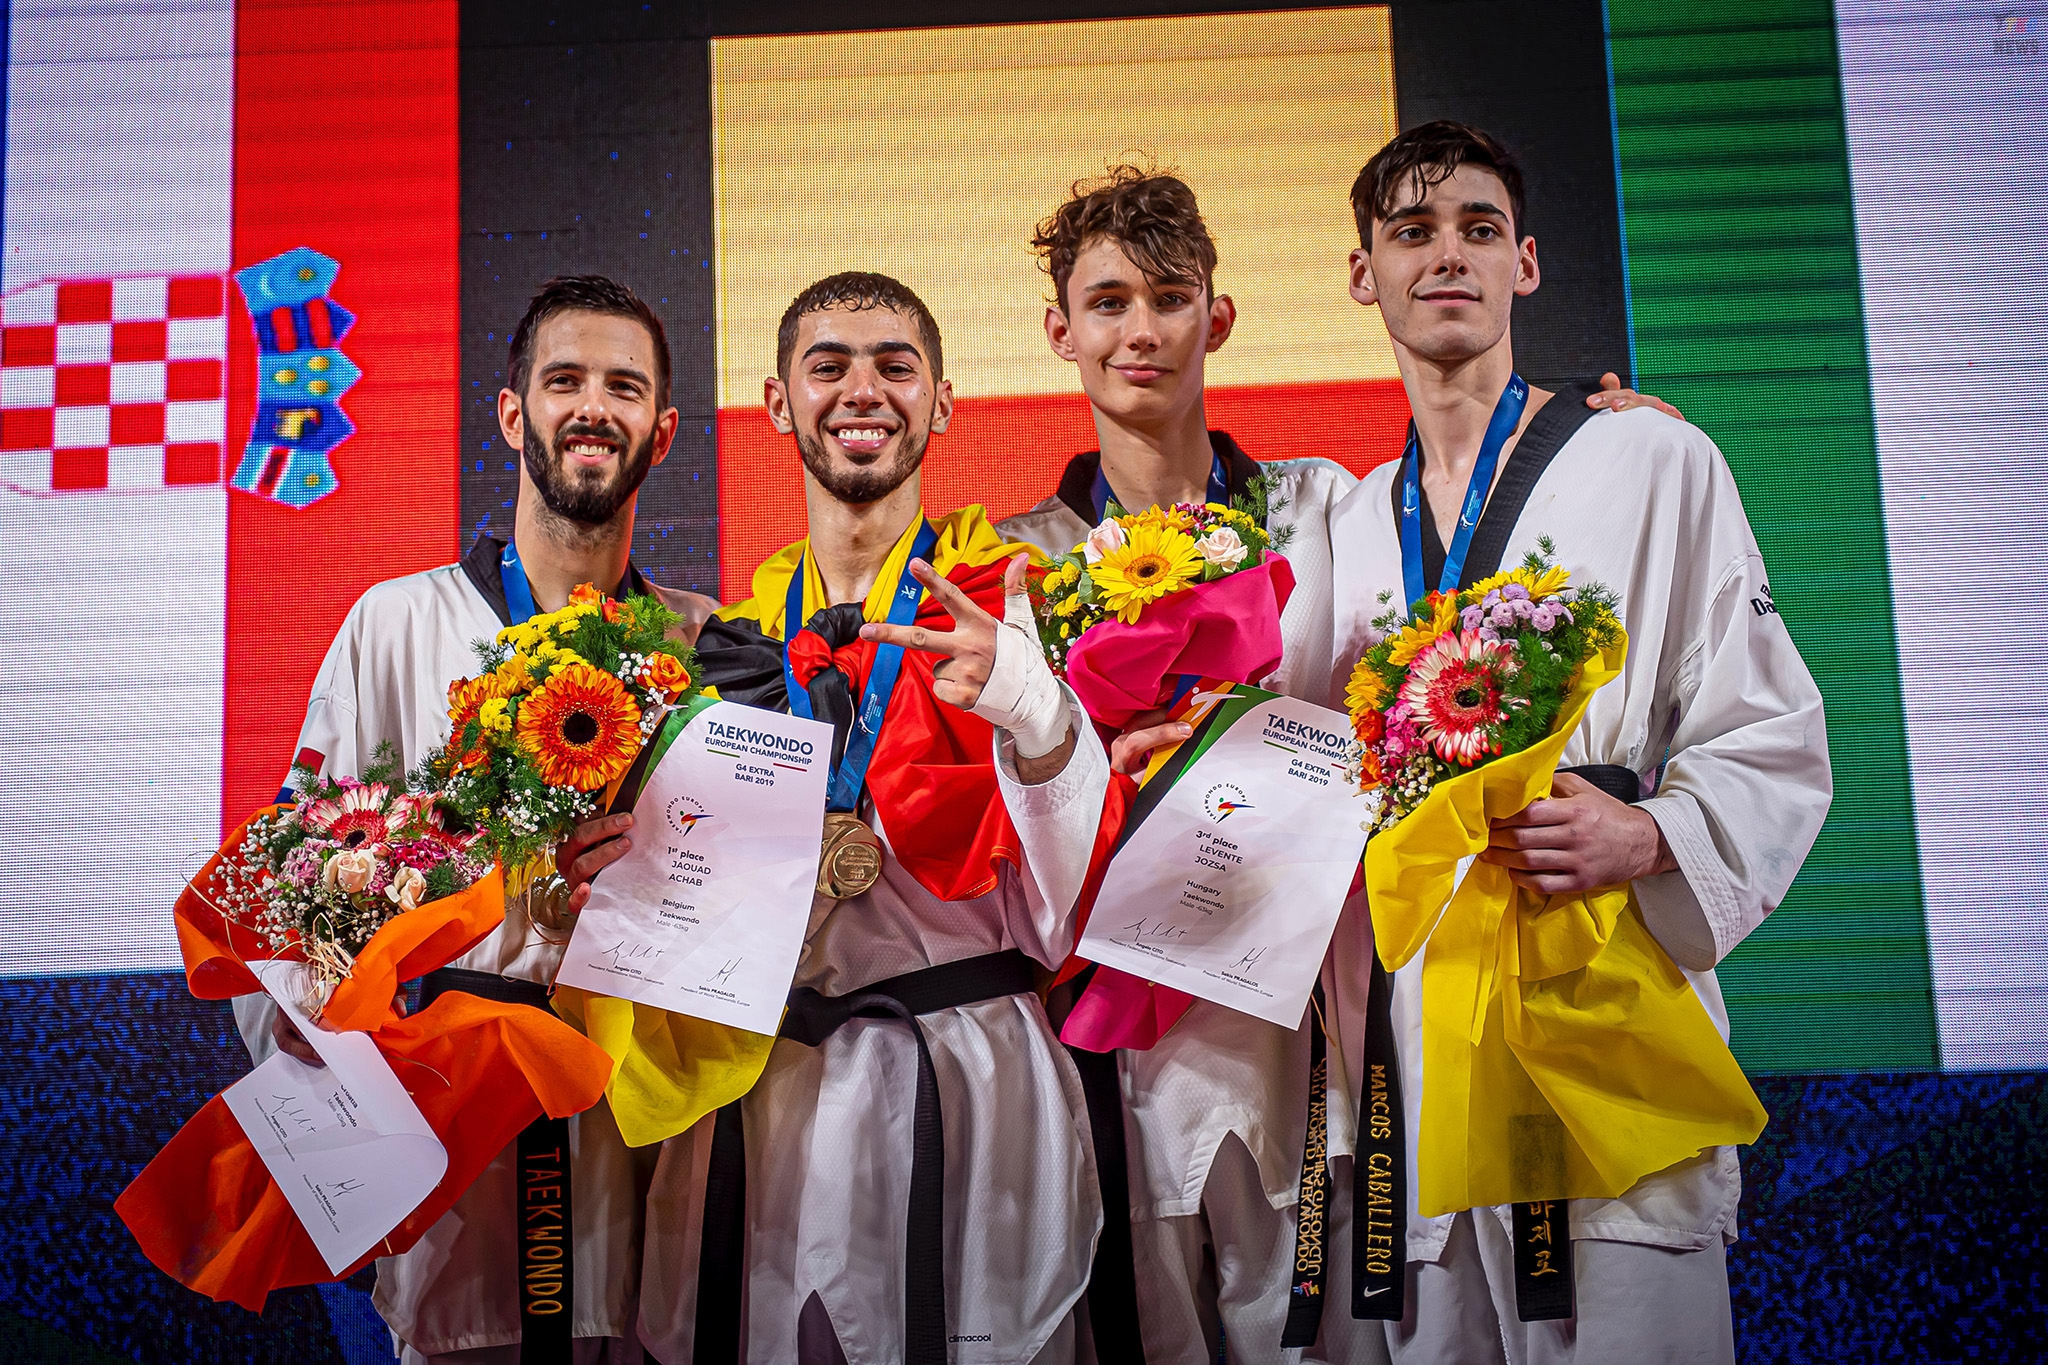 1572790009_male-63a_g4-extra-european-taekwondo-championships-bari-2019